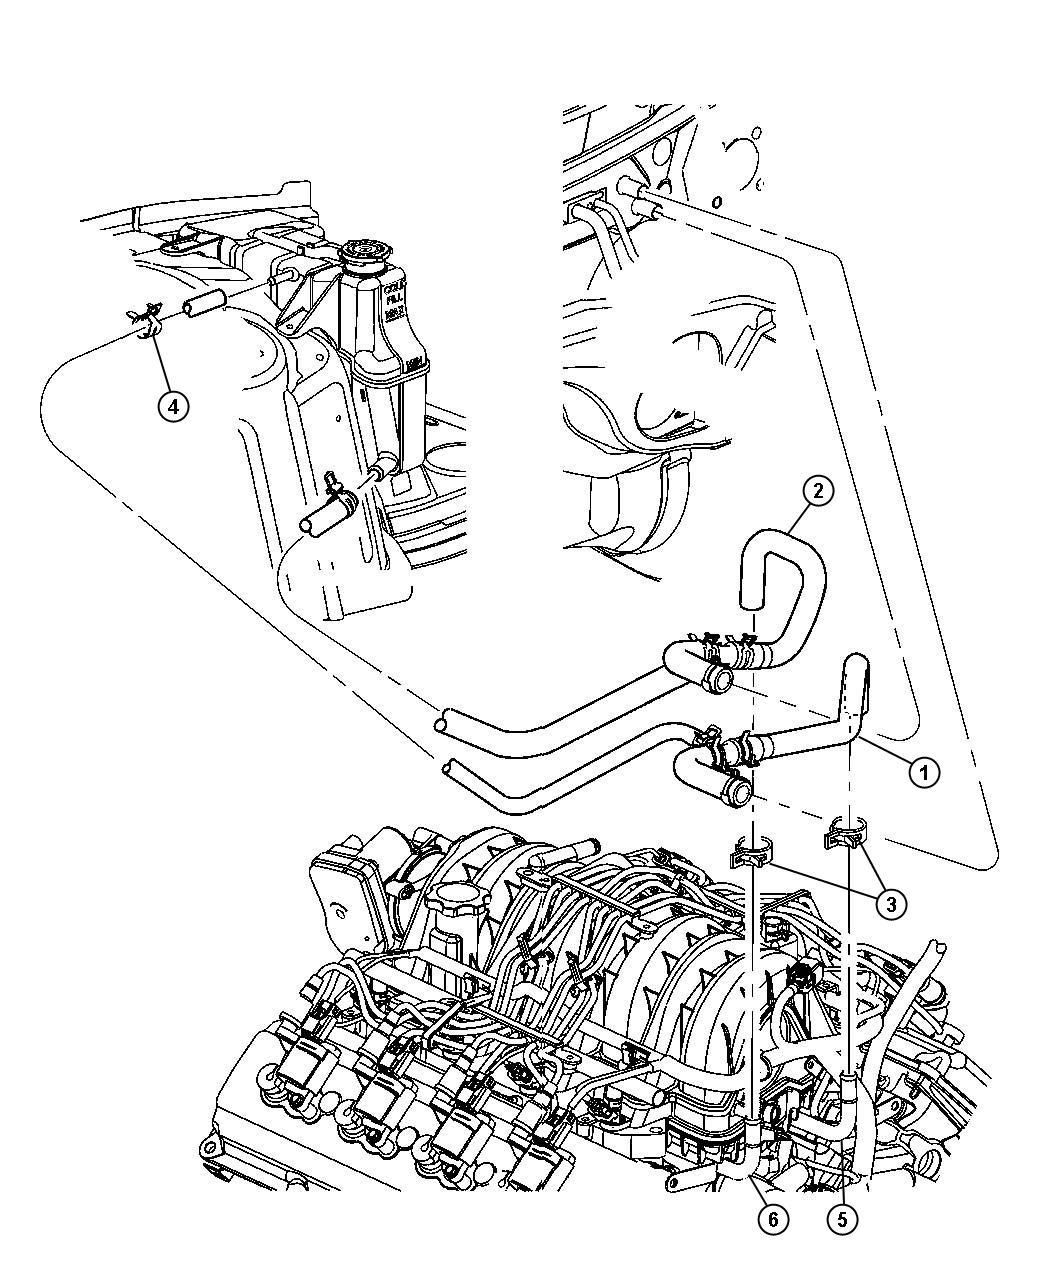 Dodge Charger Heater Plumbing